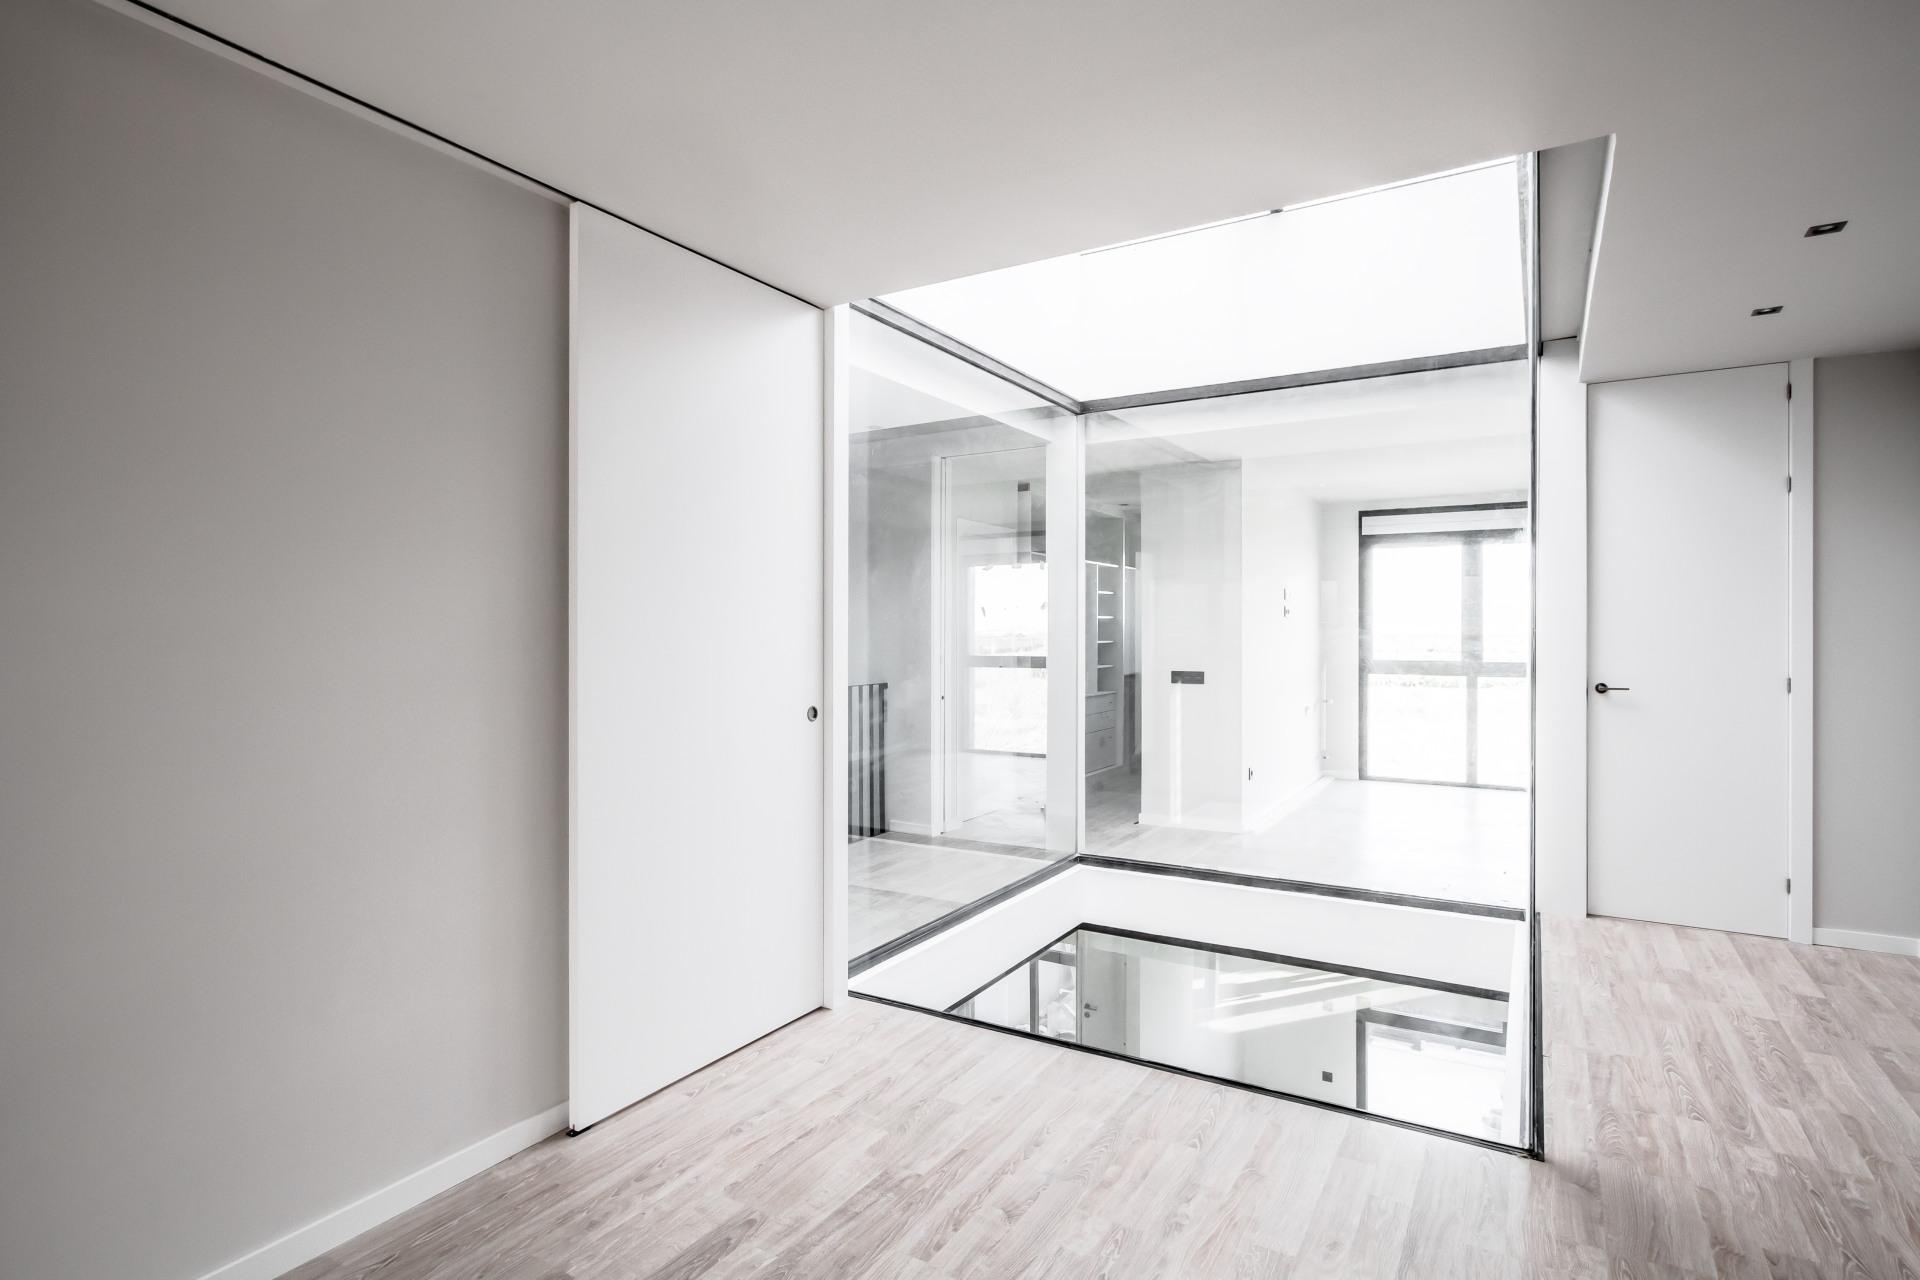 fotografia-arquitectura-valencia-german-cabo-viraje-v01 (9)